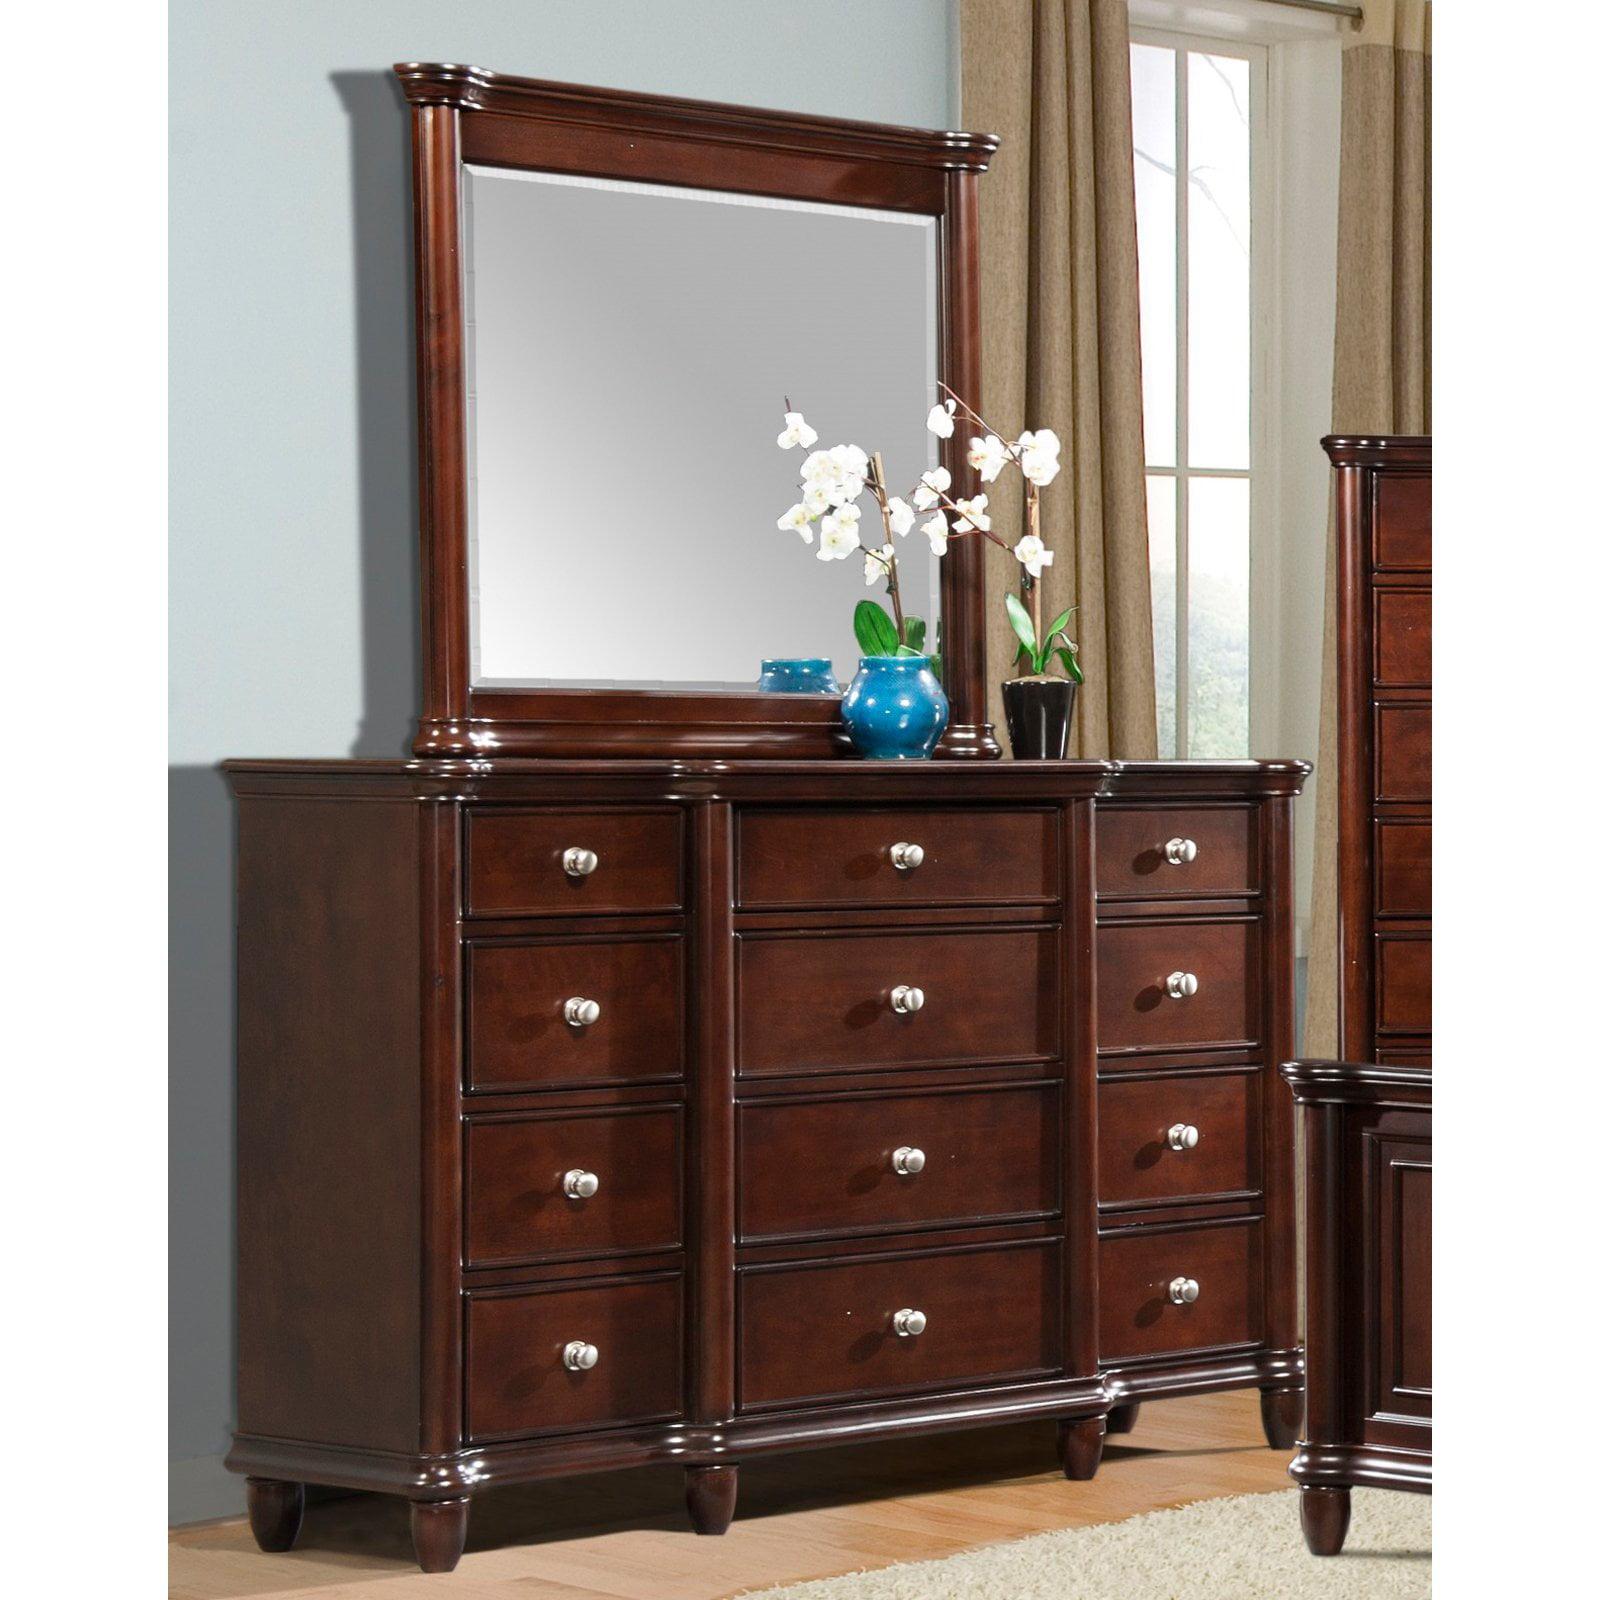 Picket House Furnishings Hamilton 12 Drawer Dresser - Warm Brown Cherry